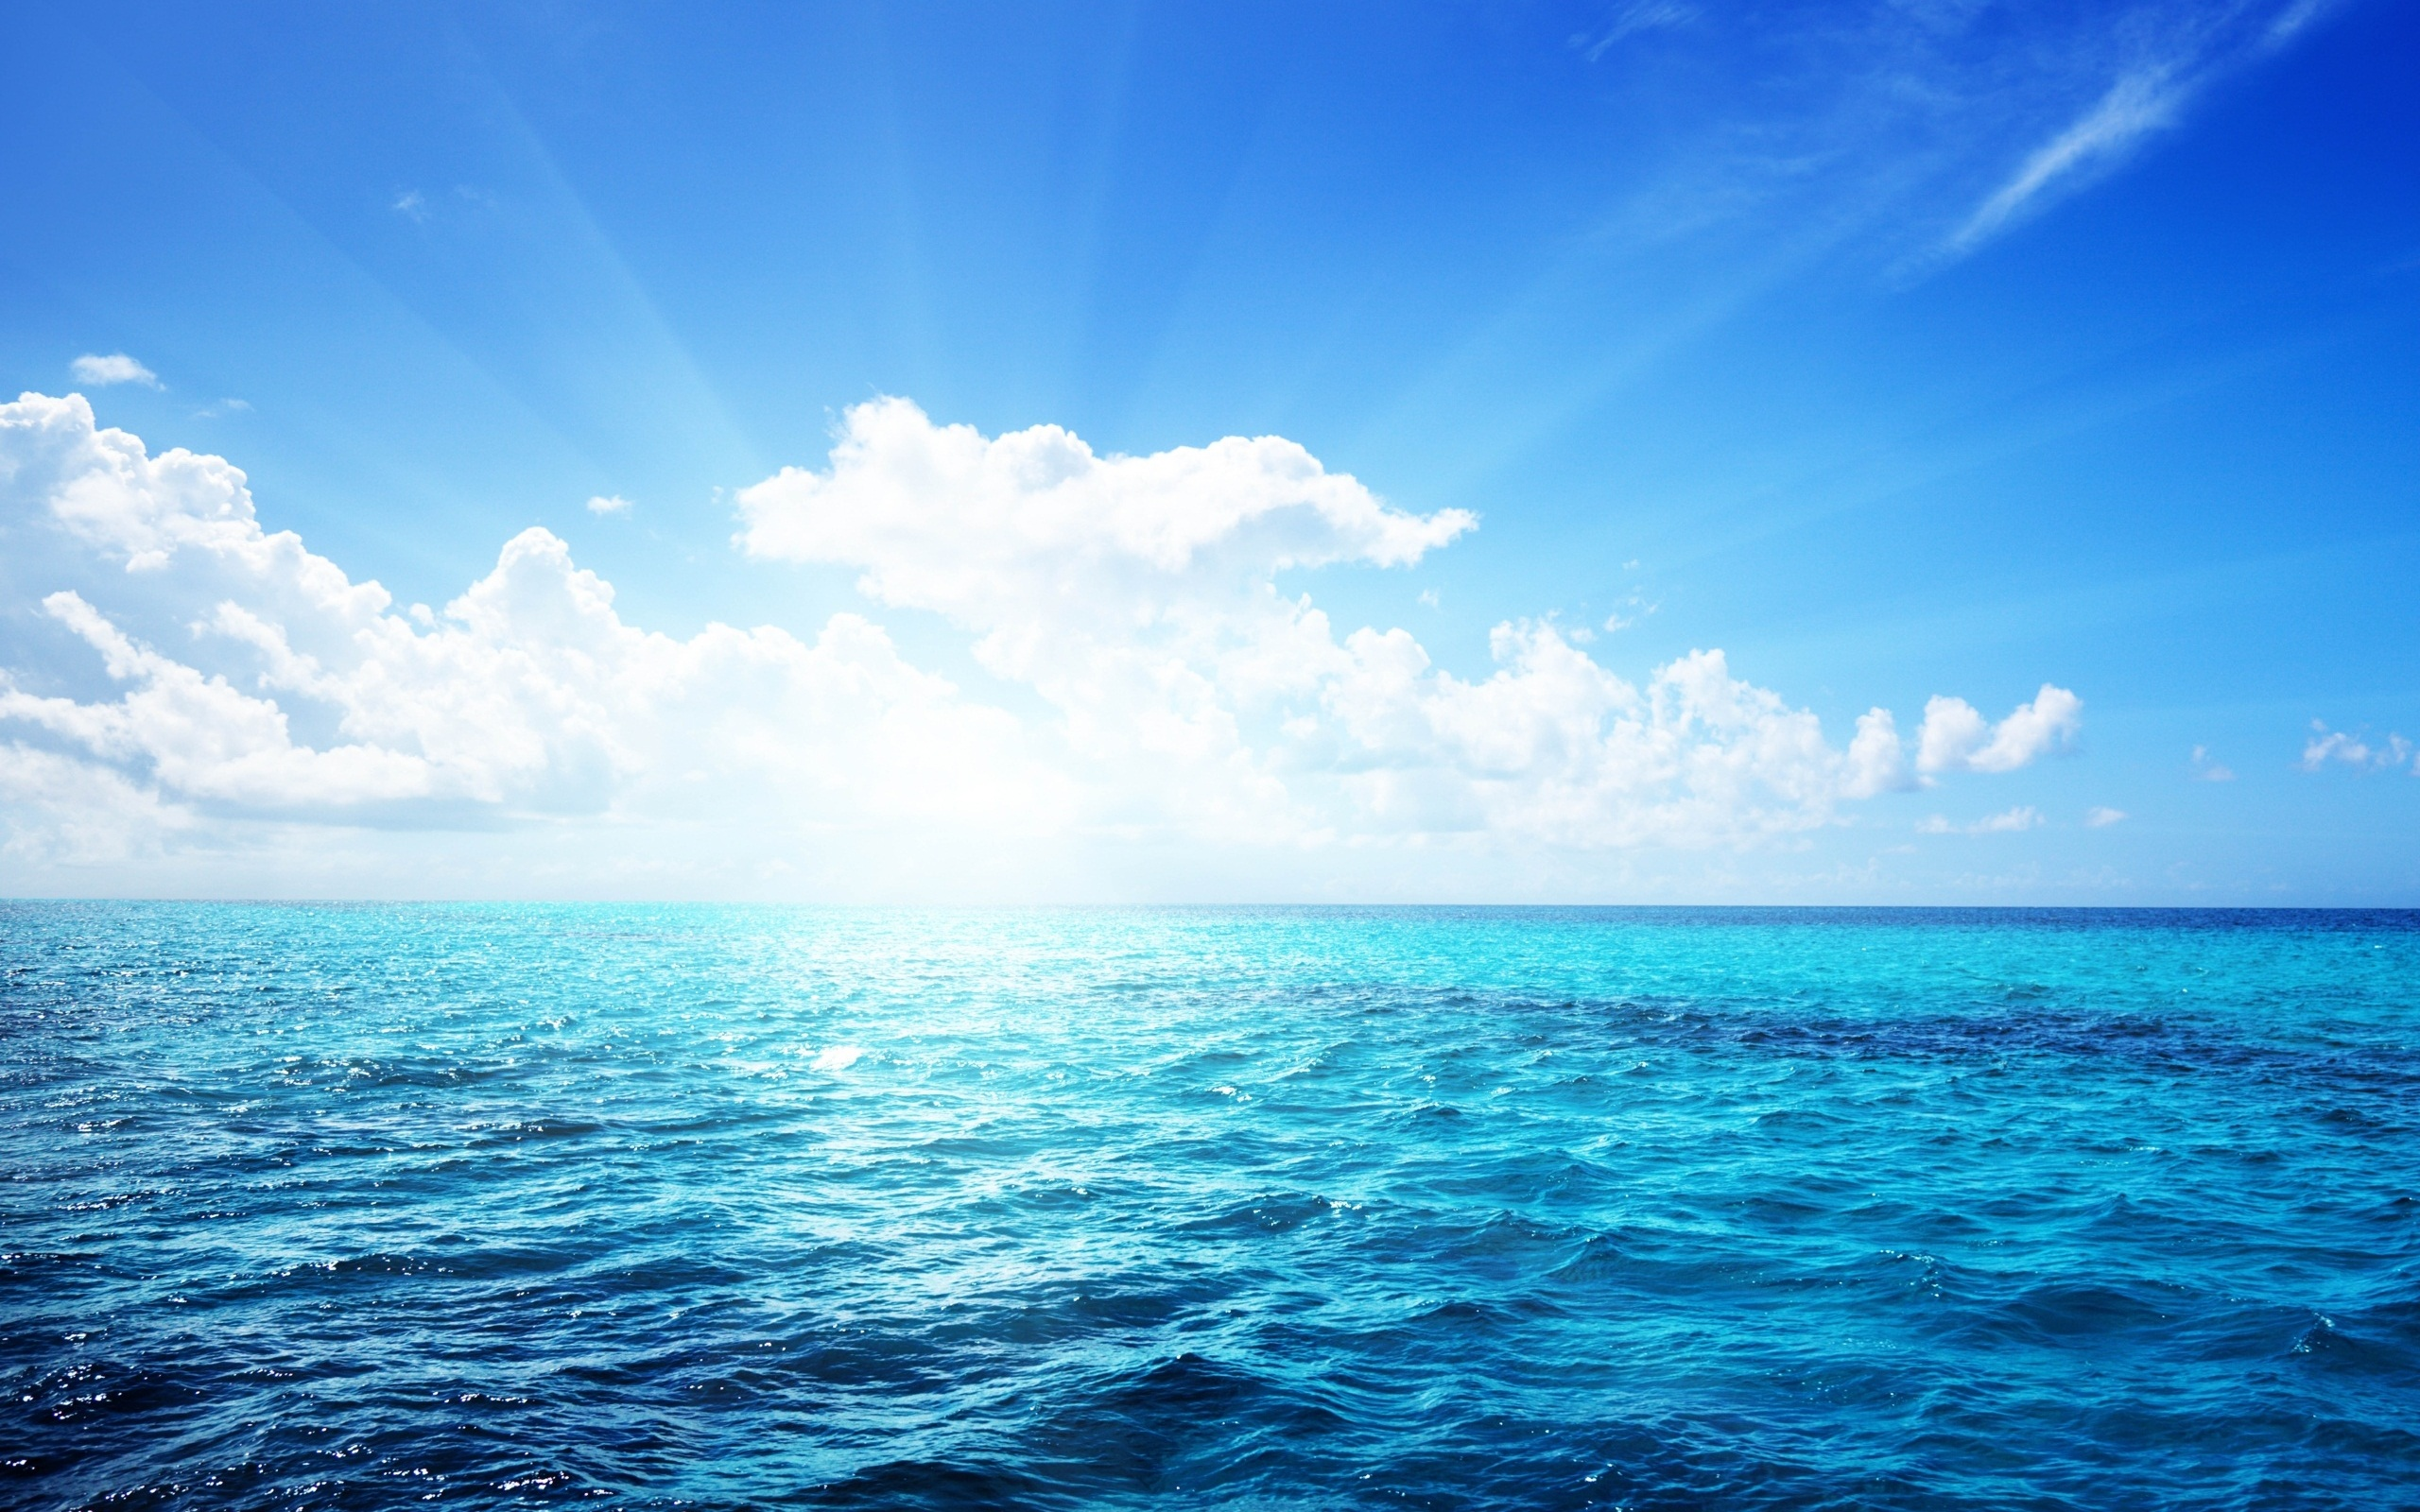 Море и солнце обои для рабочего стола ...: www.rabstol.net/oboi/sea/4301-more-i-solnce.html